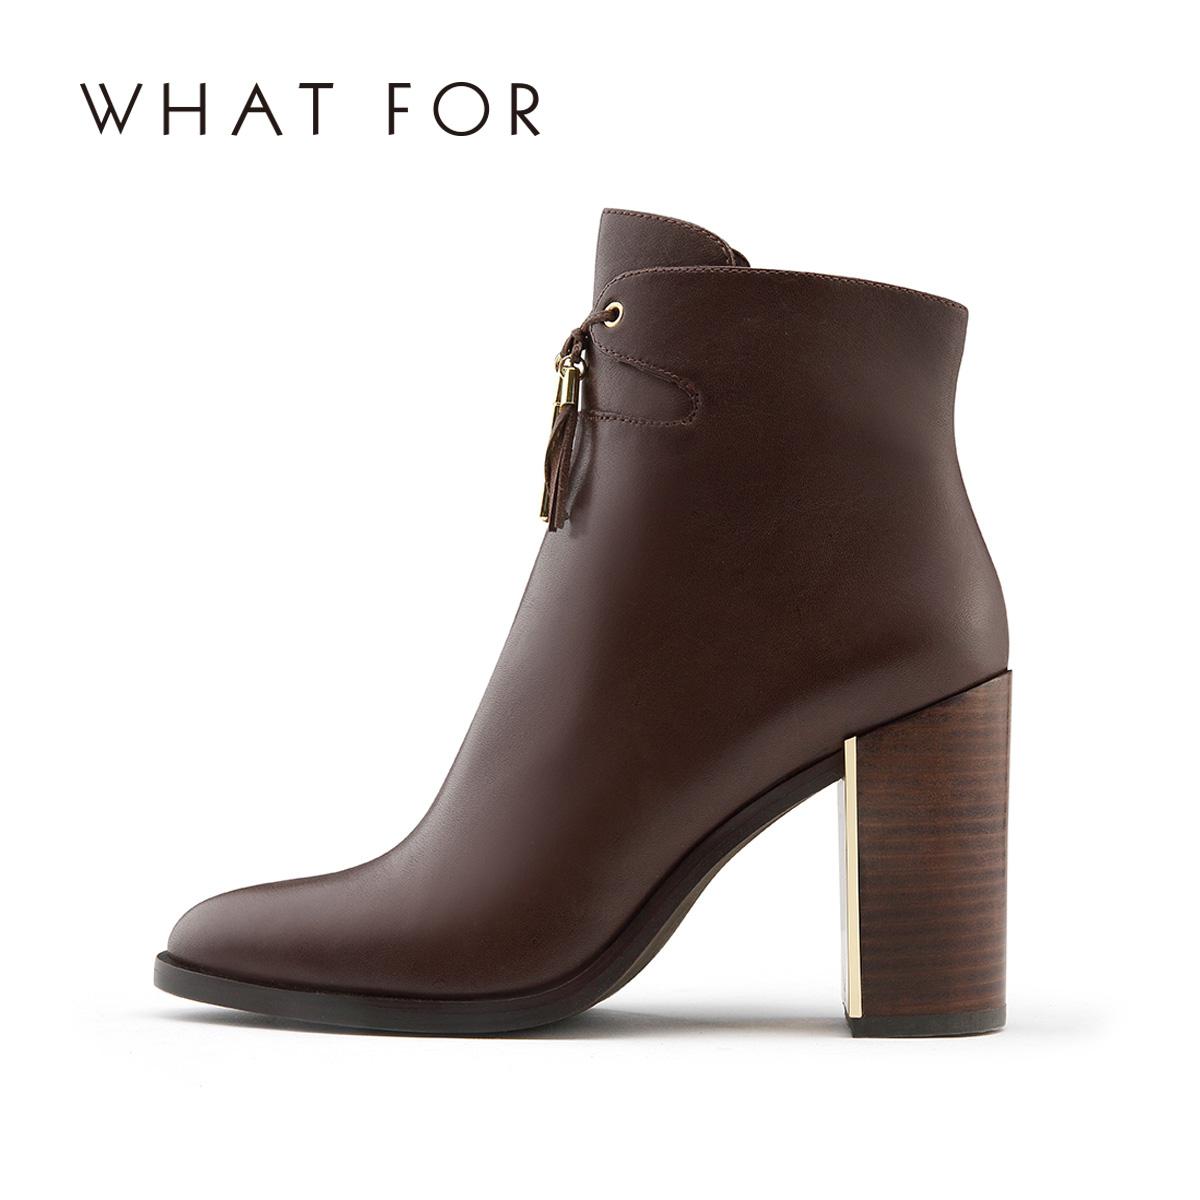 WHAT FOR女靴秋冬粗高跟女士短靴流苏装饰靴子女 WG320L11146